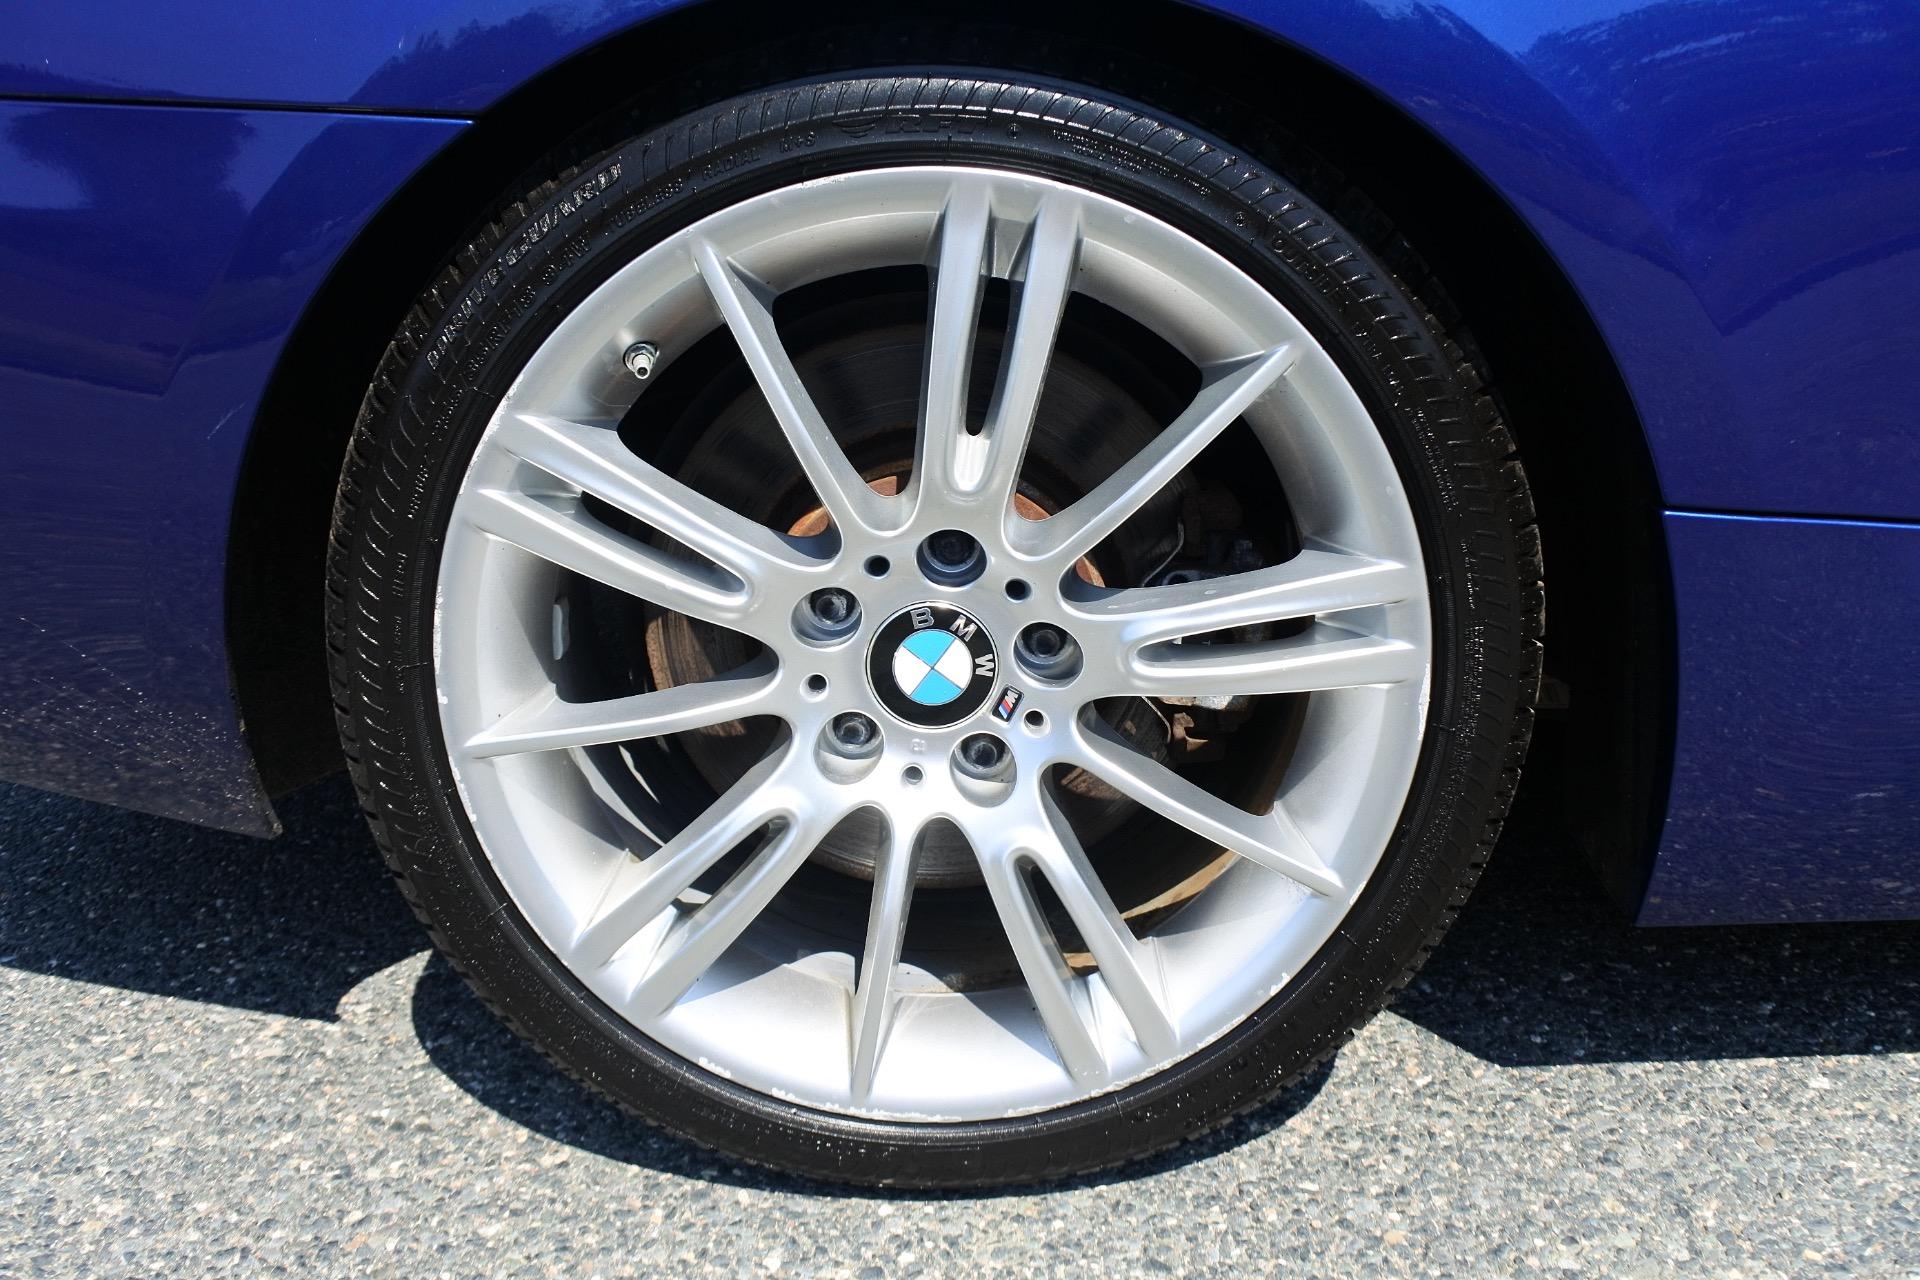 Used 2013 BMW 3 Series 2dr Conv 335i Used 2013 BMW 3 Series 2dr Conv 335i for sale  at Metro West Motorcars LLC in Shrewsbury MA 24